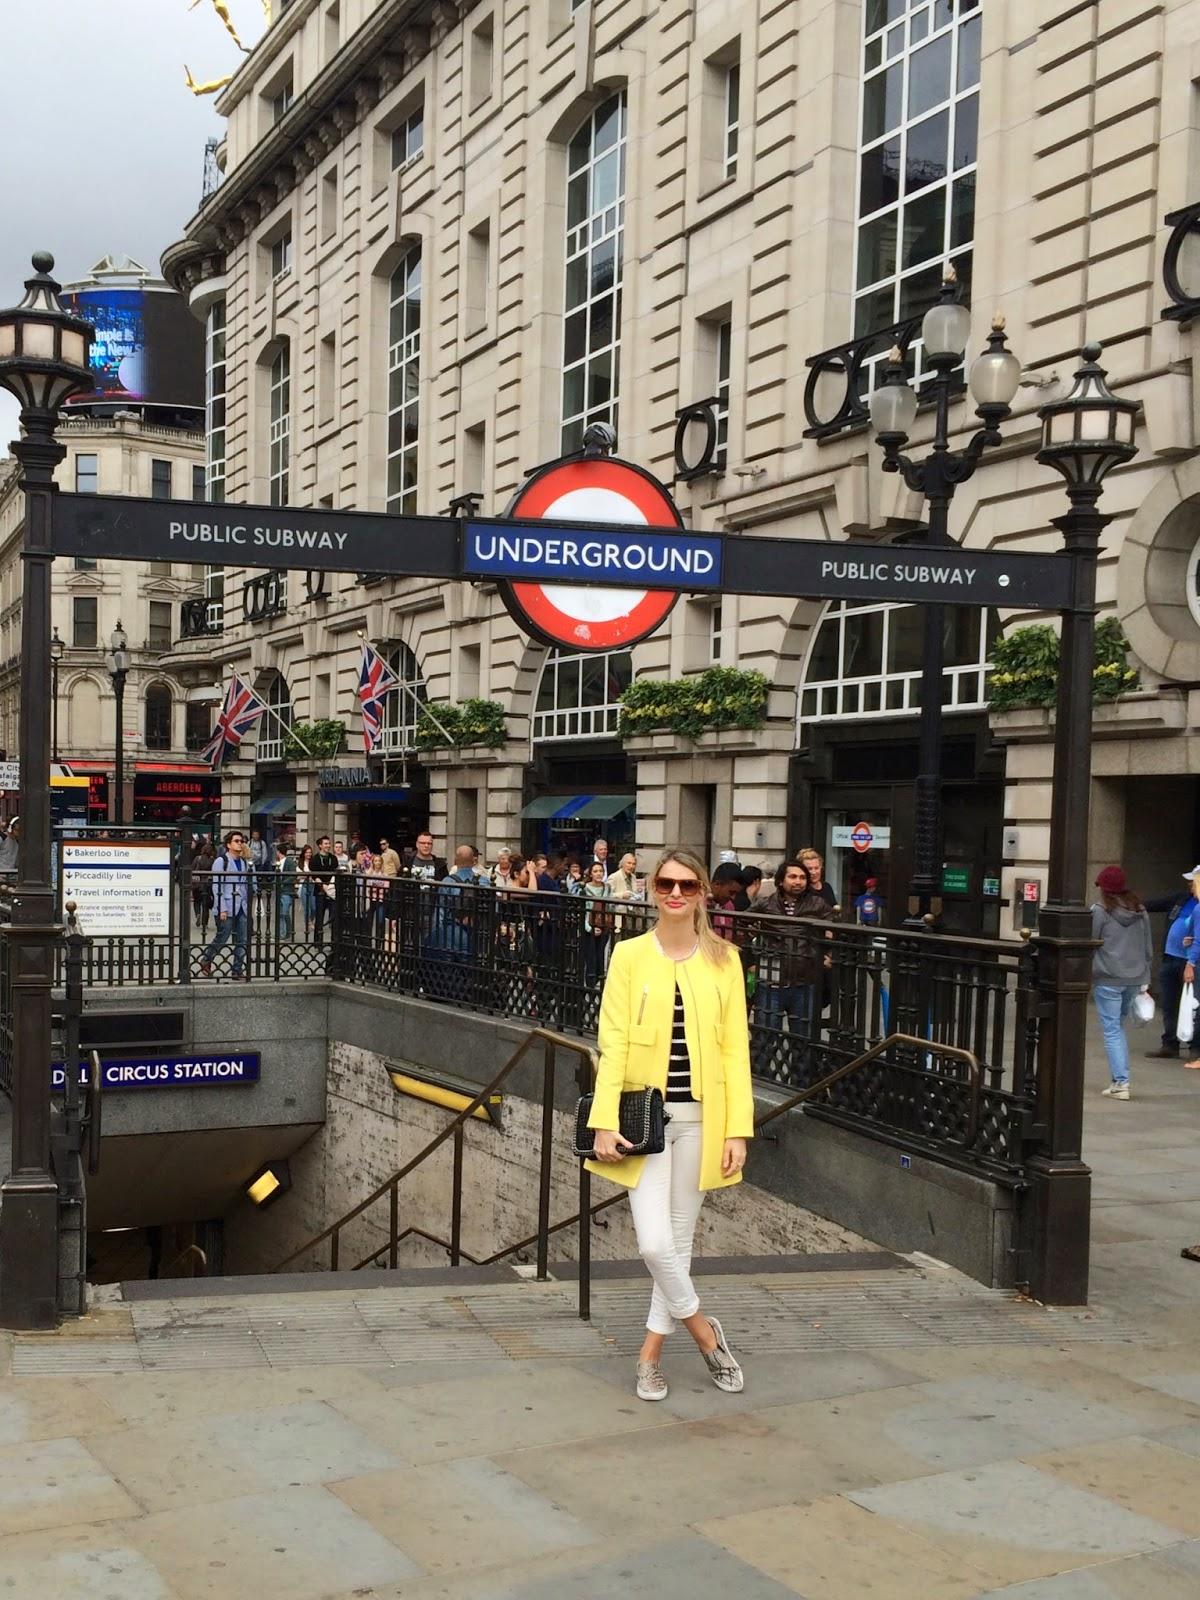 London underground, yellow coat, zara yellow coat, zara sale, zara sale coat, zara slipons, j brand jeans, j brand skinny jeans, piccadilly, oxford circus, london